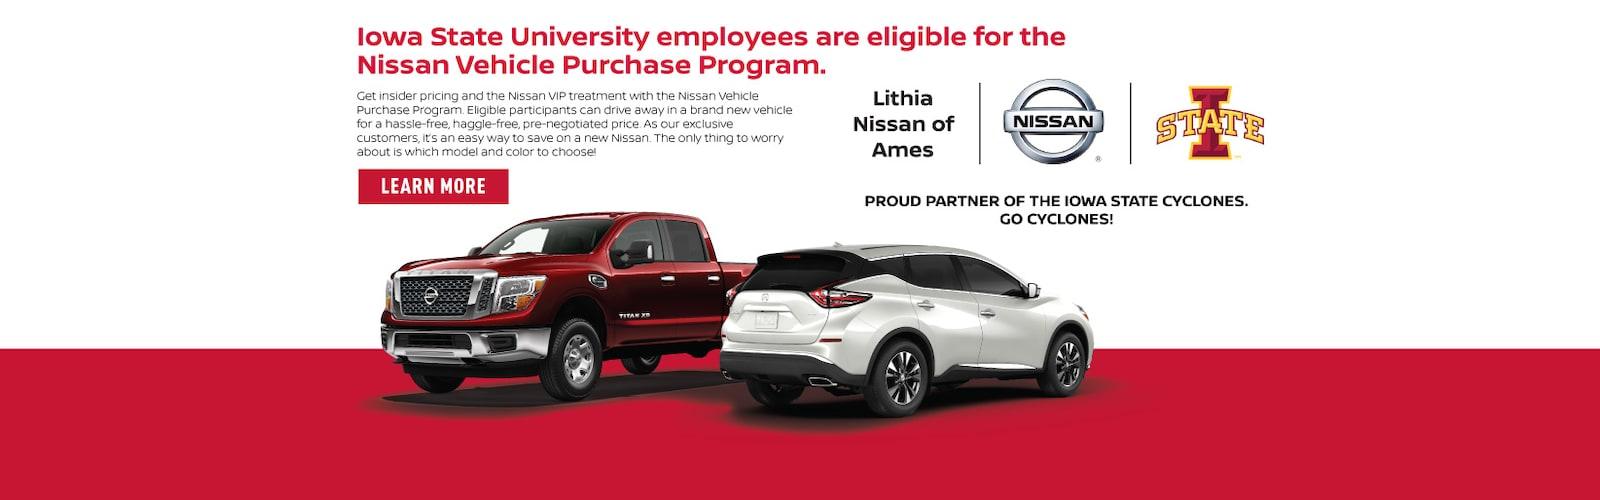 Ames Car Dealers >> New Used Car Dealer Ames Ia Lithia Nissan Of Ames Serving Des